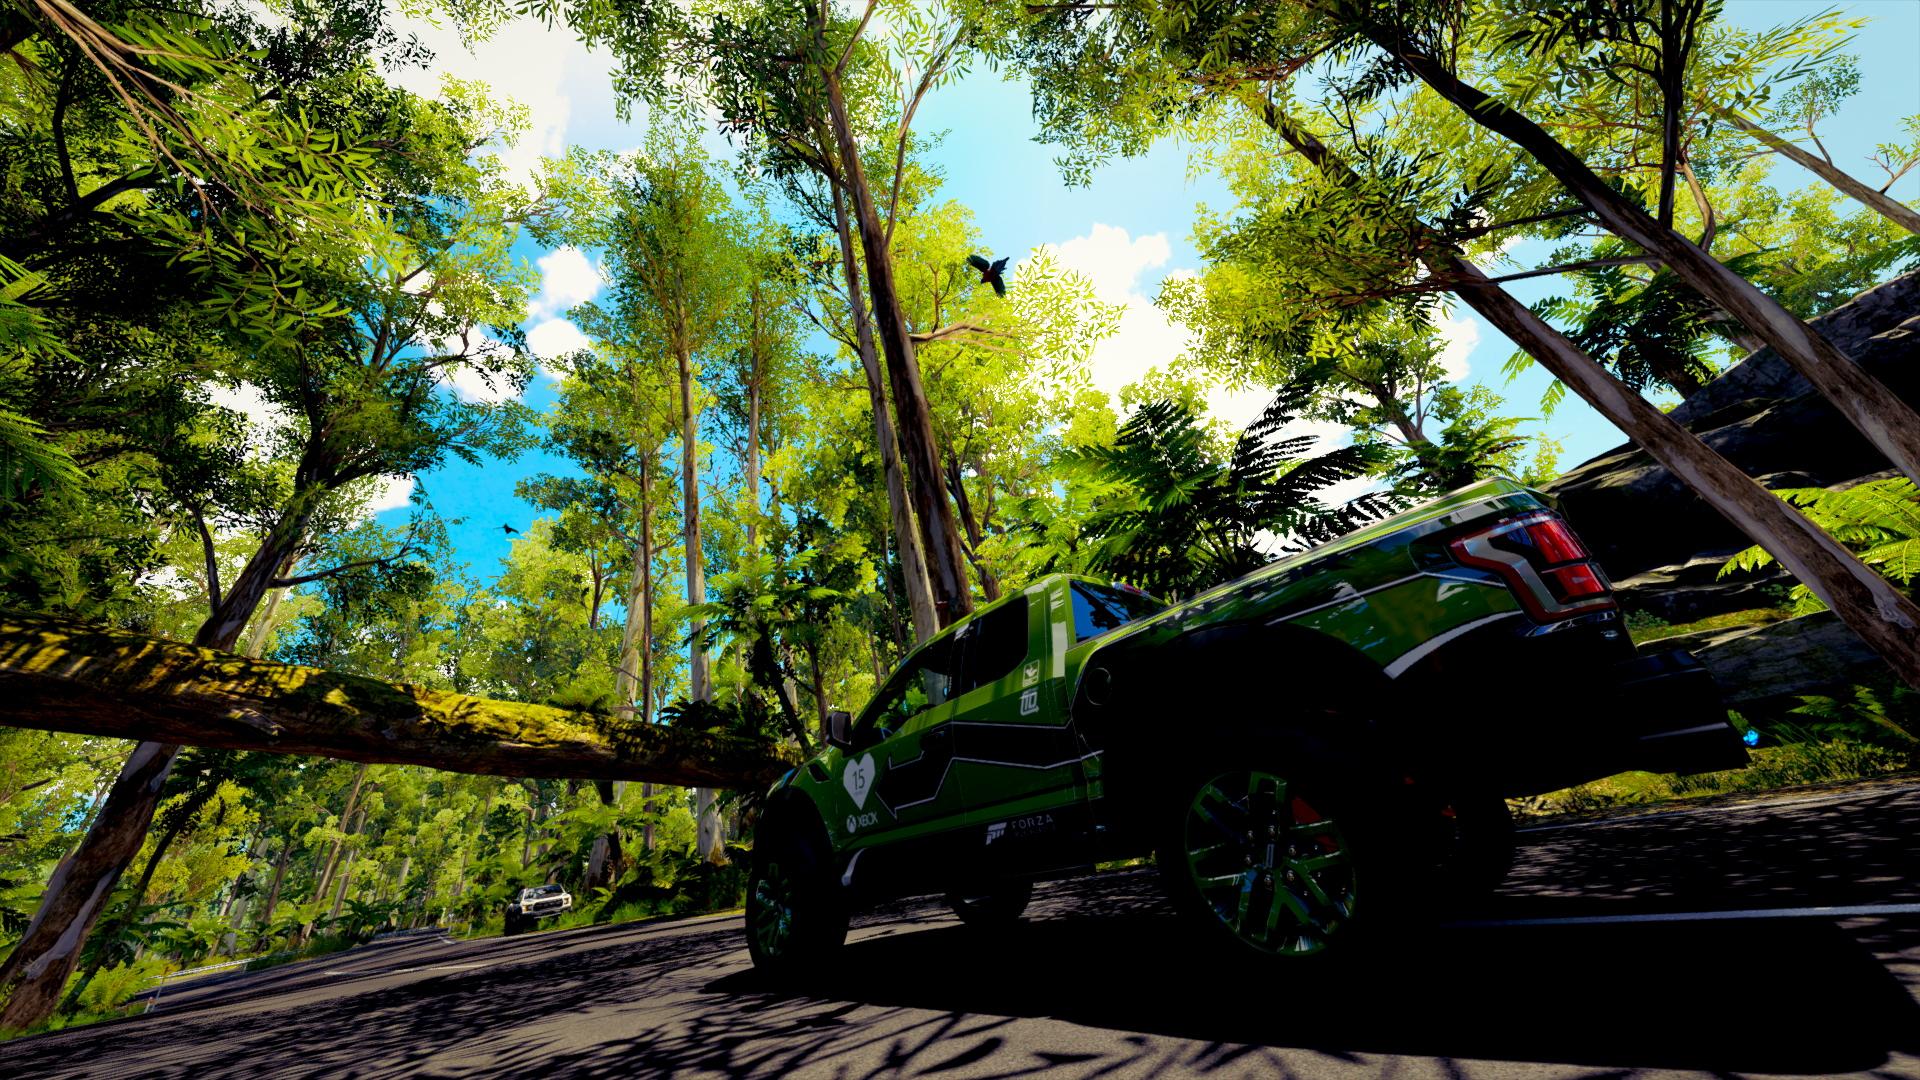 Forza Horizon 5 site map of Puerto Rico rainforest